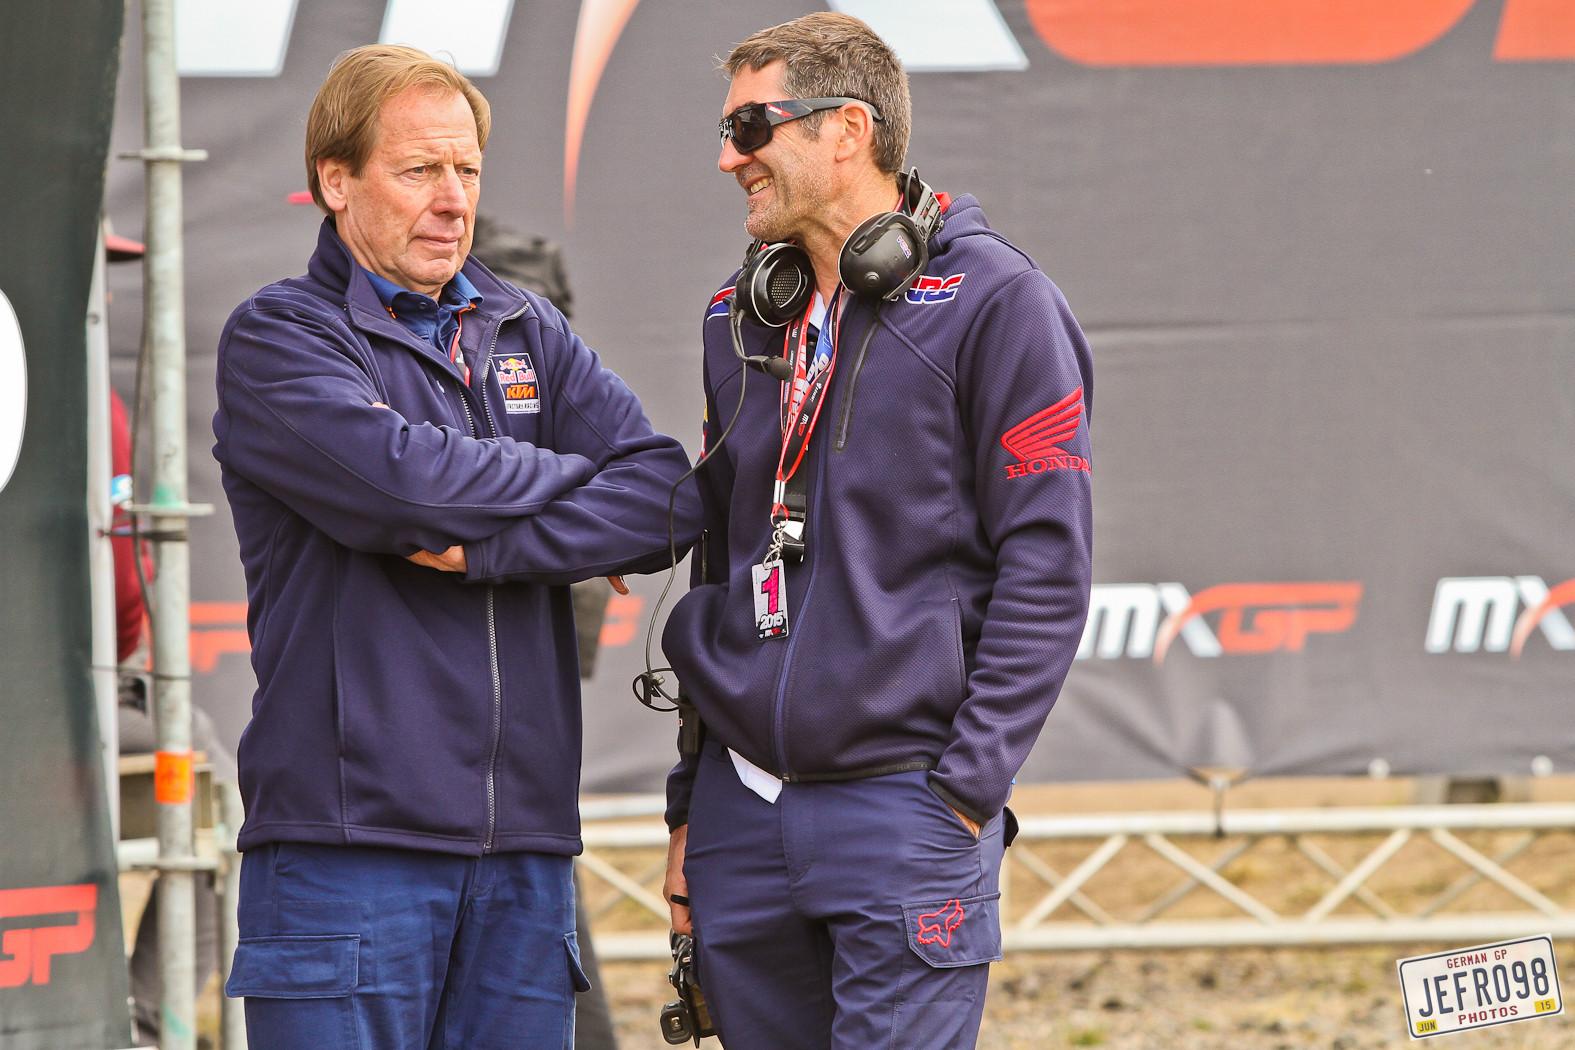 Roger De Coster & Jean Michel Bayle - Photo Blast: MXGP of Germany - Motocross Pictures - Vital MX